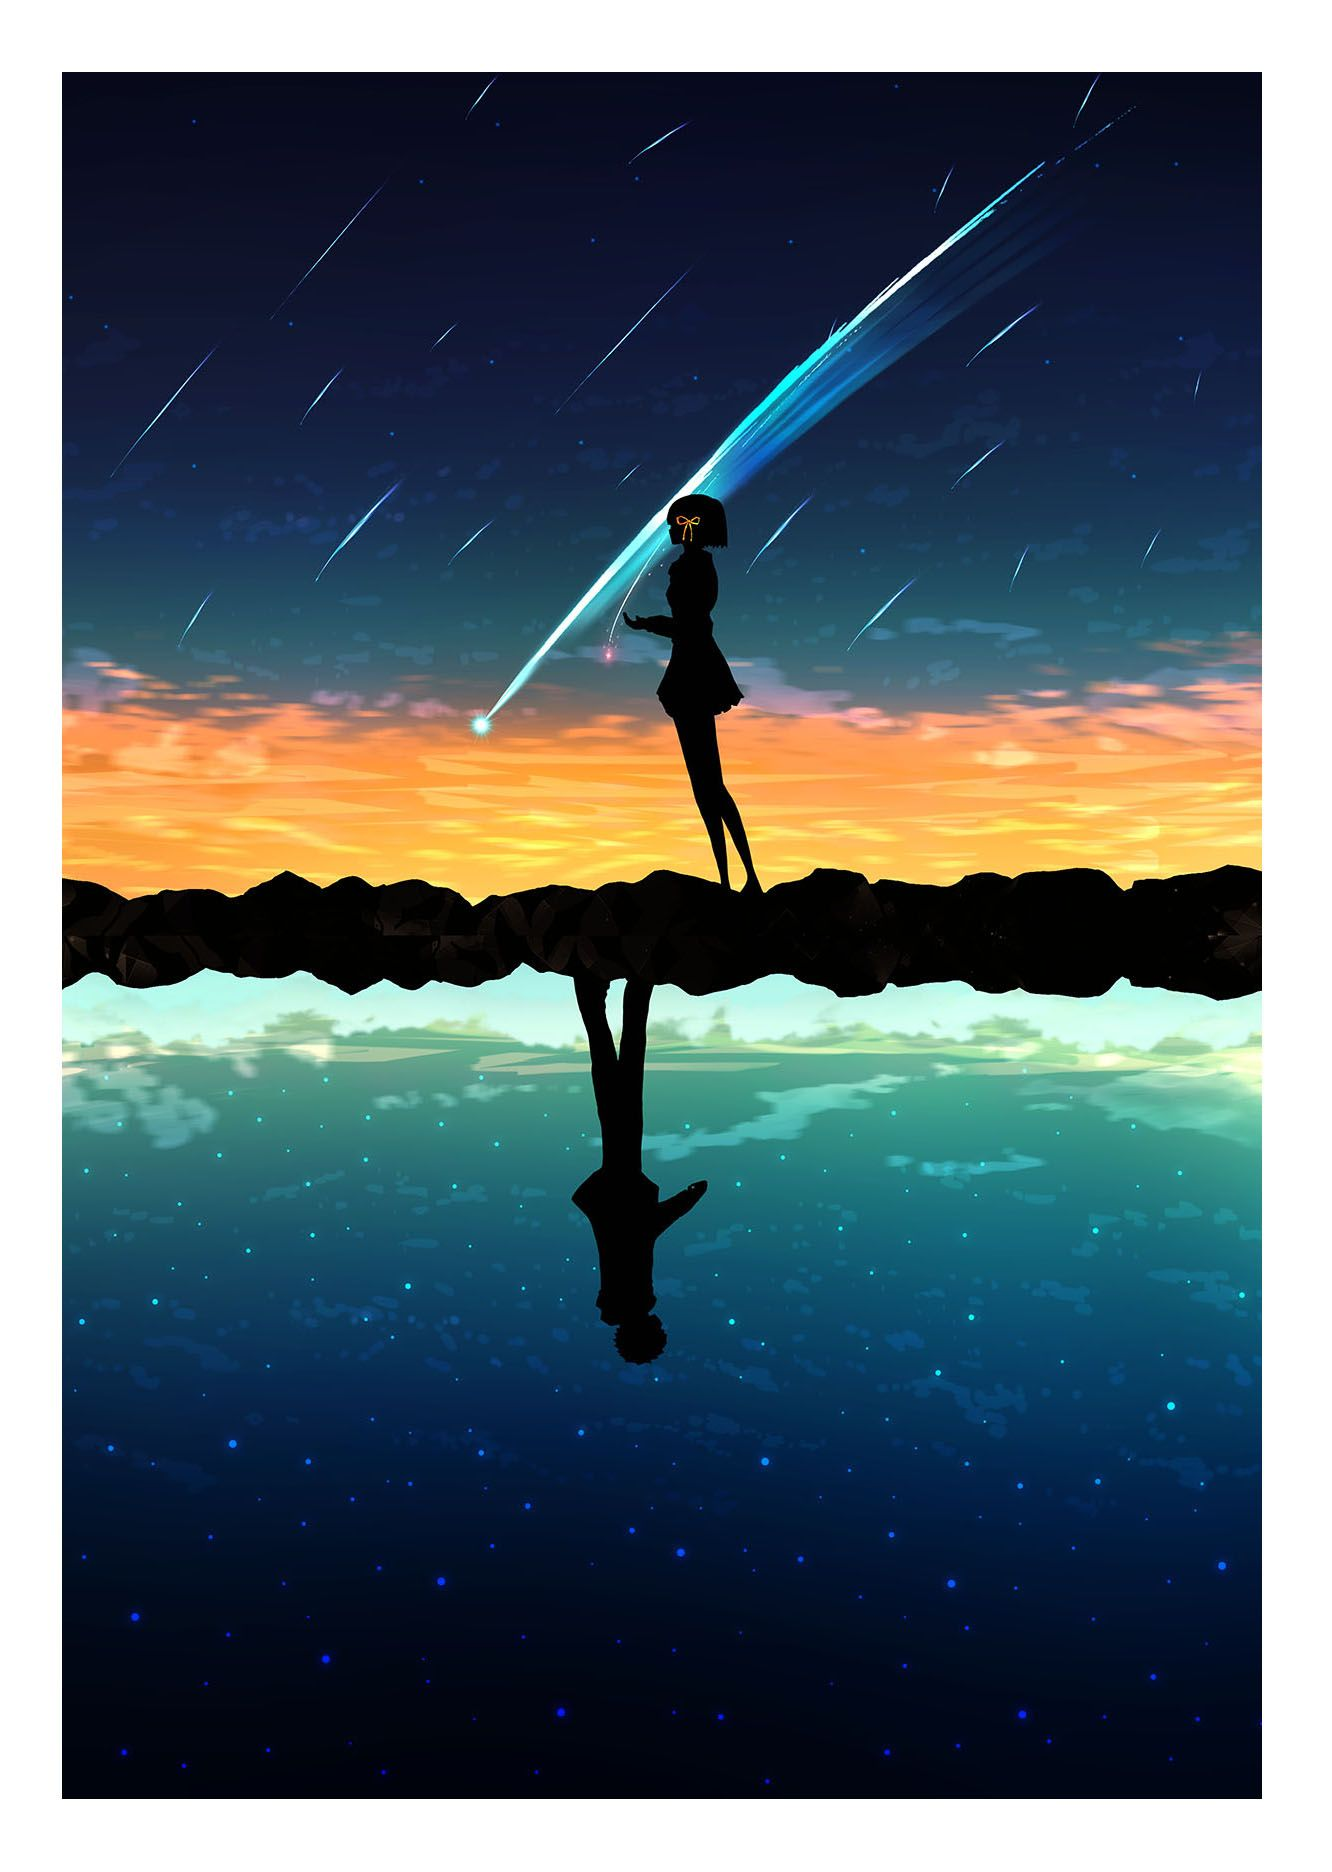 Kimi no na wa Posters Pinterest Anime, Manga and